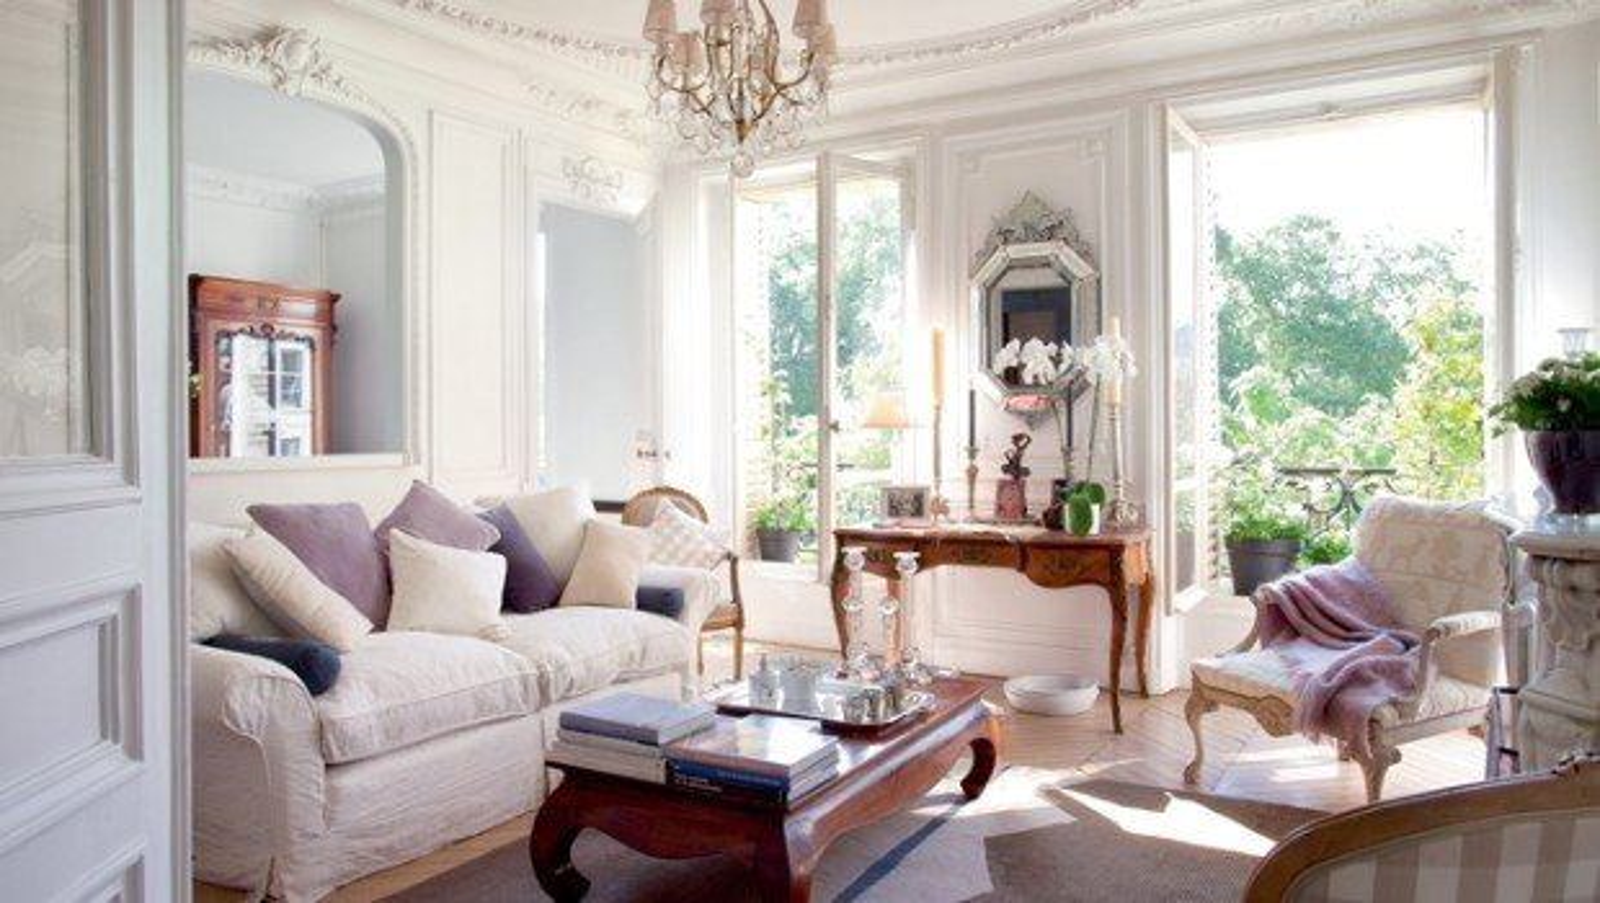 Real Estate: квартира героини «Завтрак у Тиффани» выставлена на ...   350x620